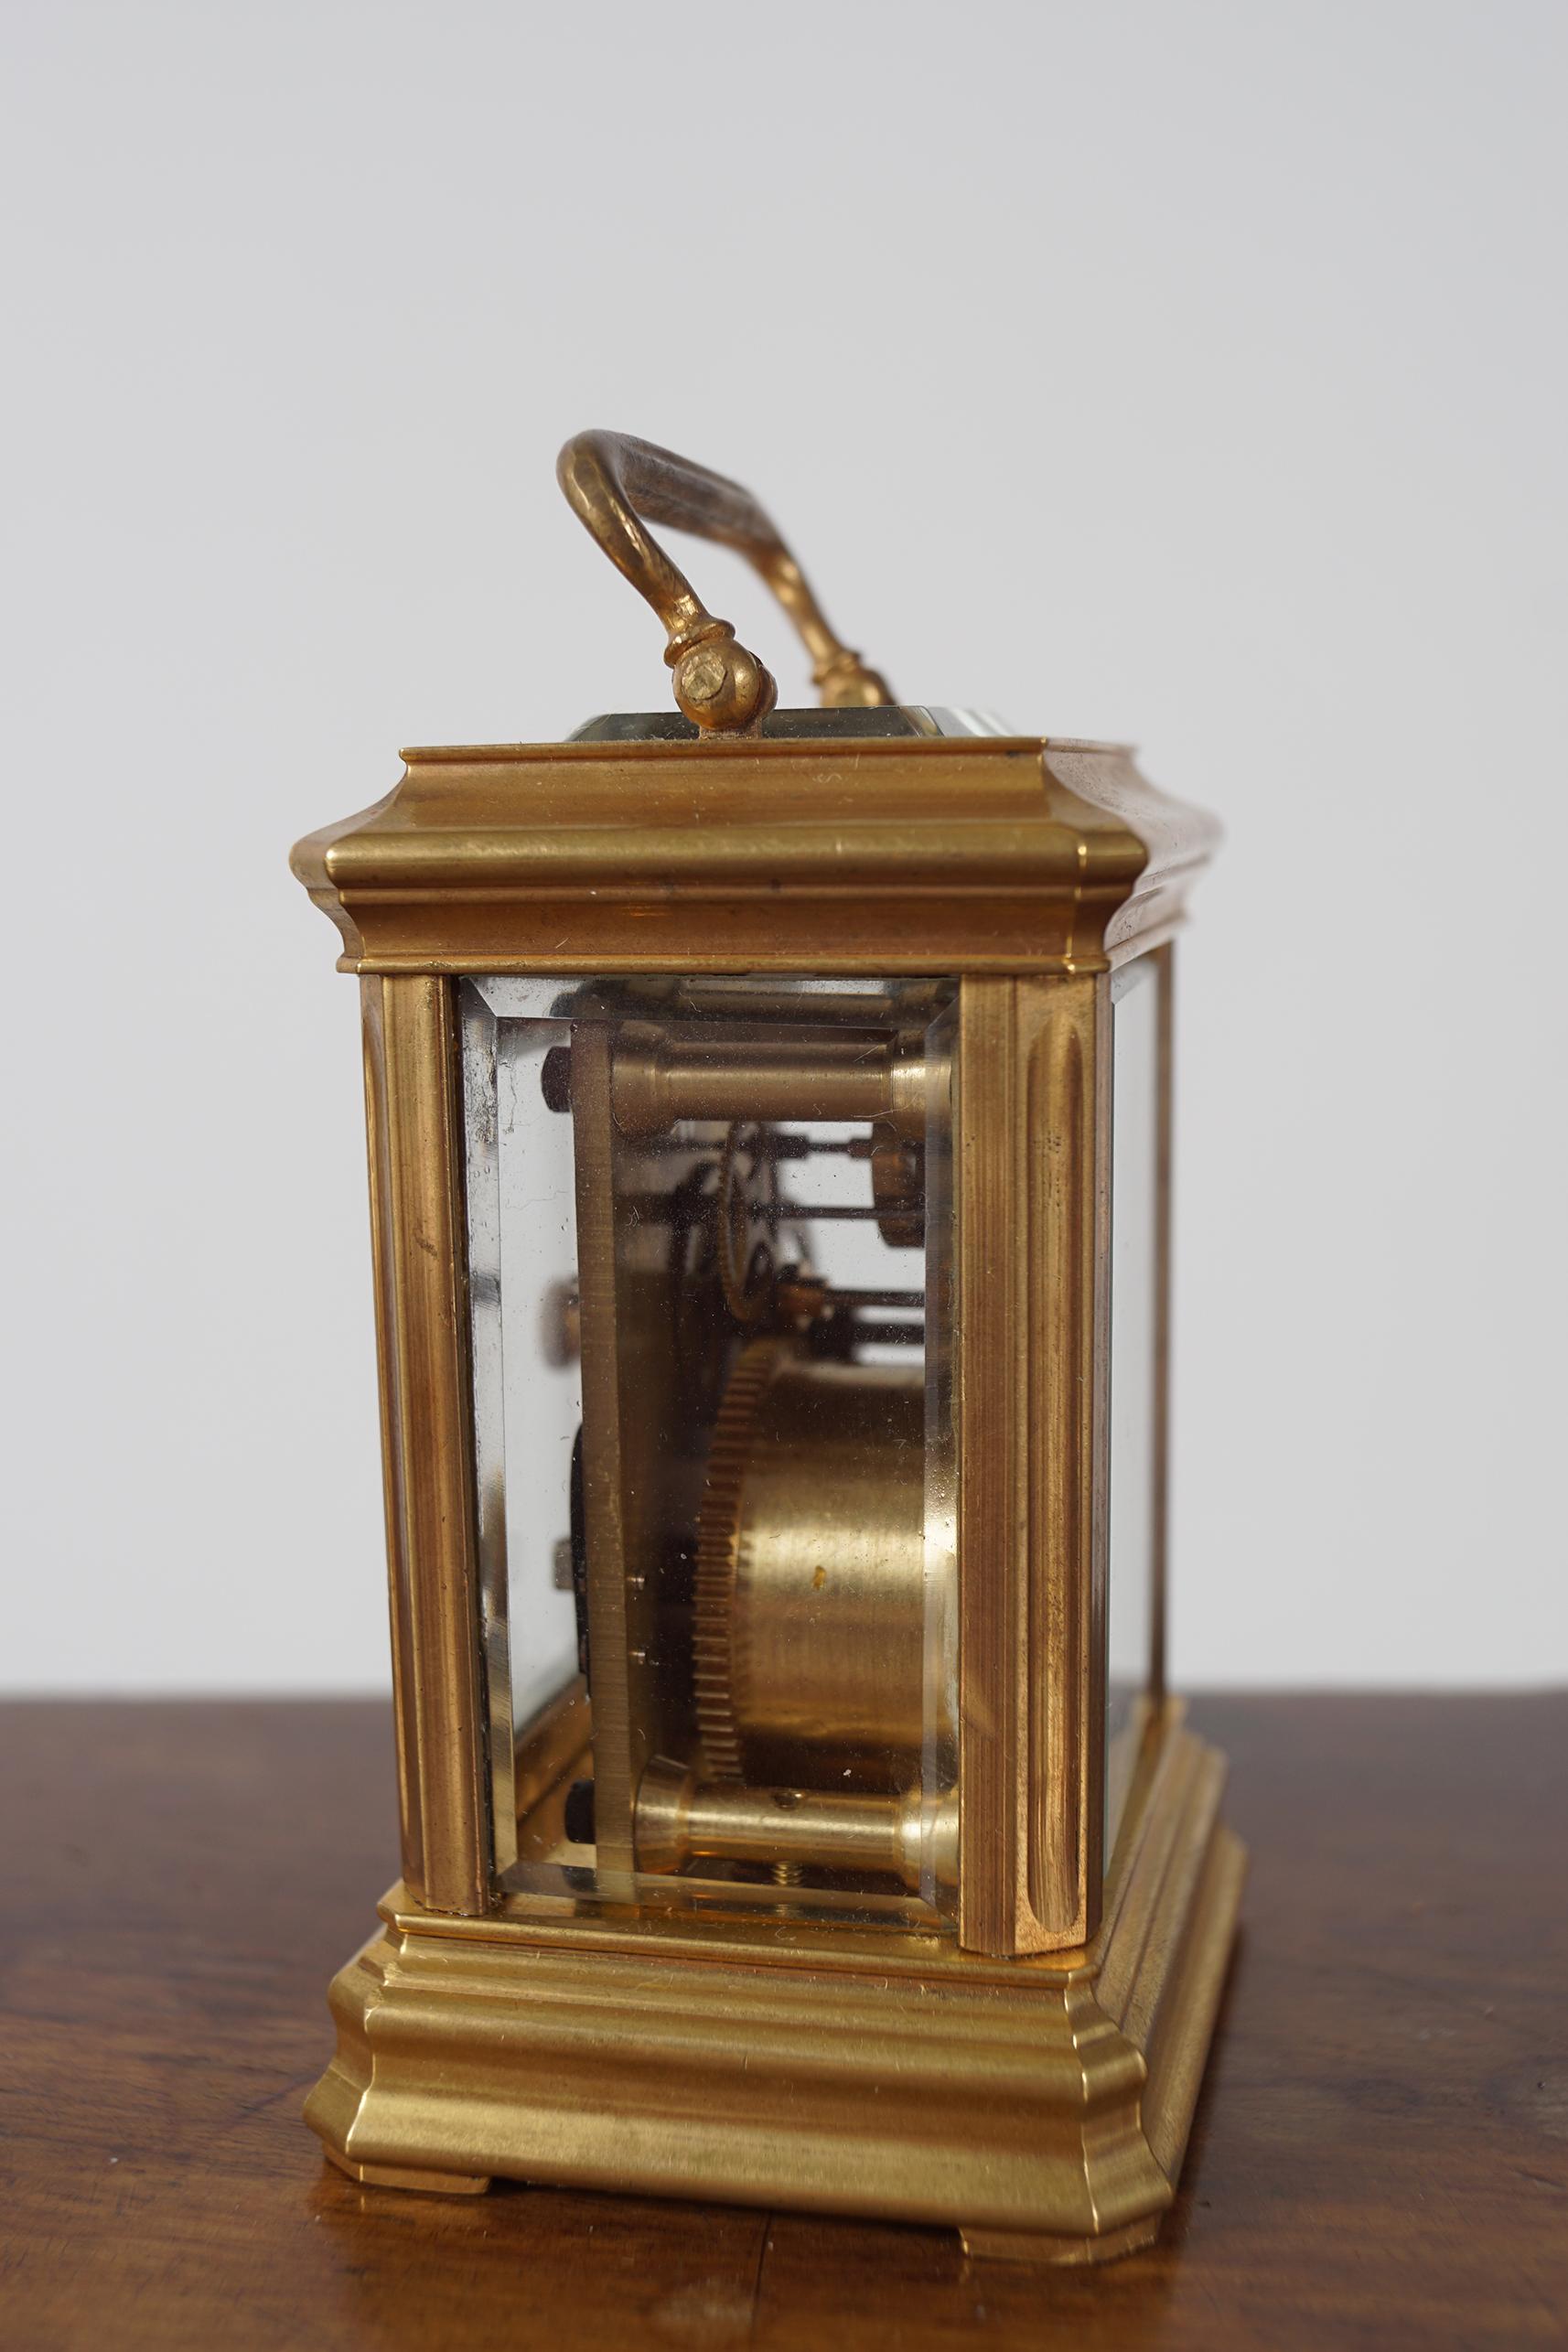 MINIATURE BRASS CARRIAGE CLOCK - Image 2 of 4